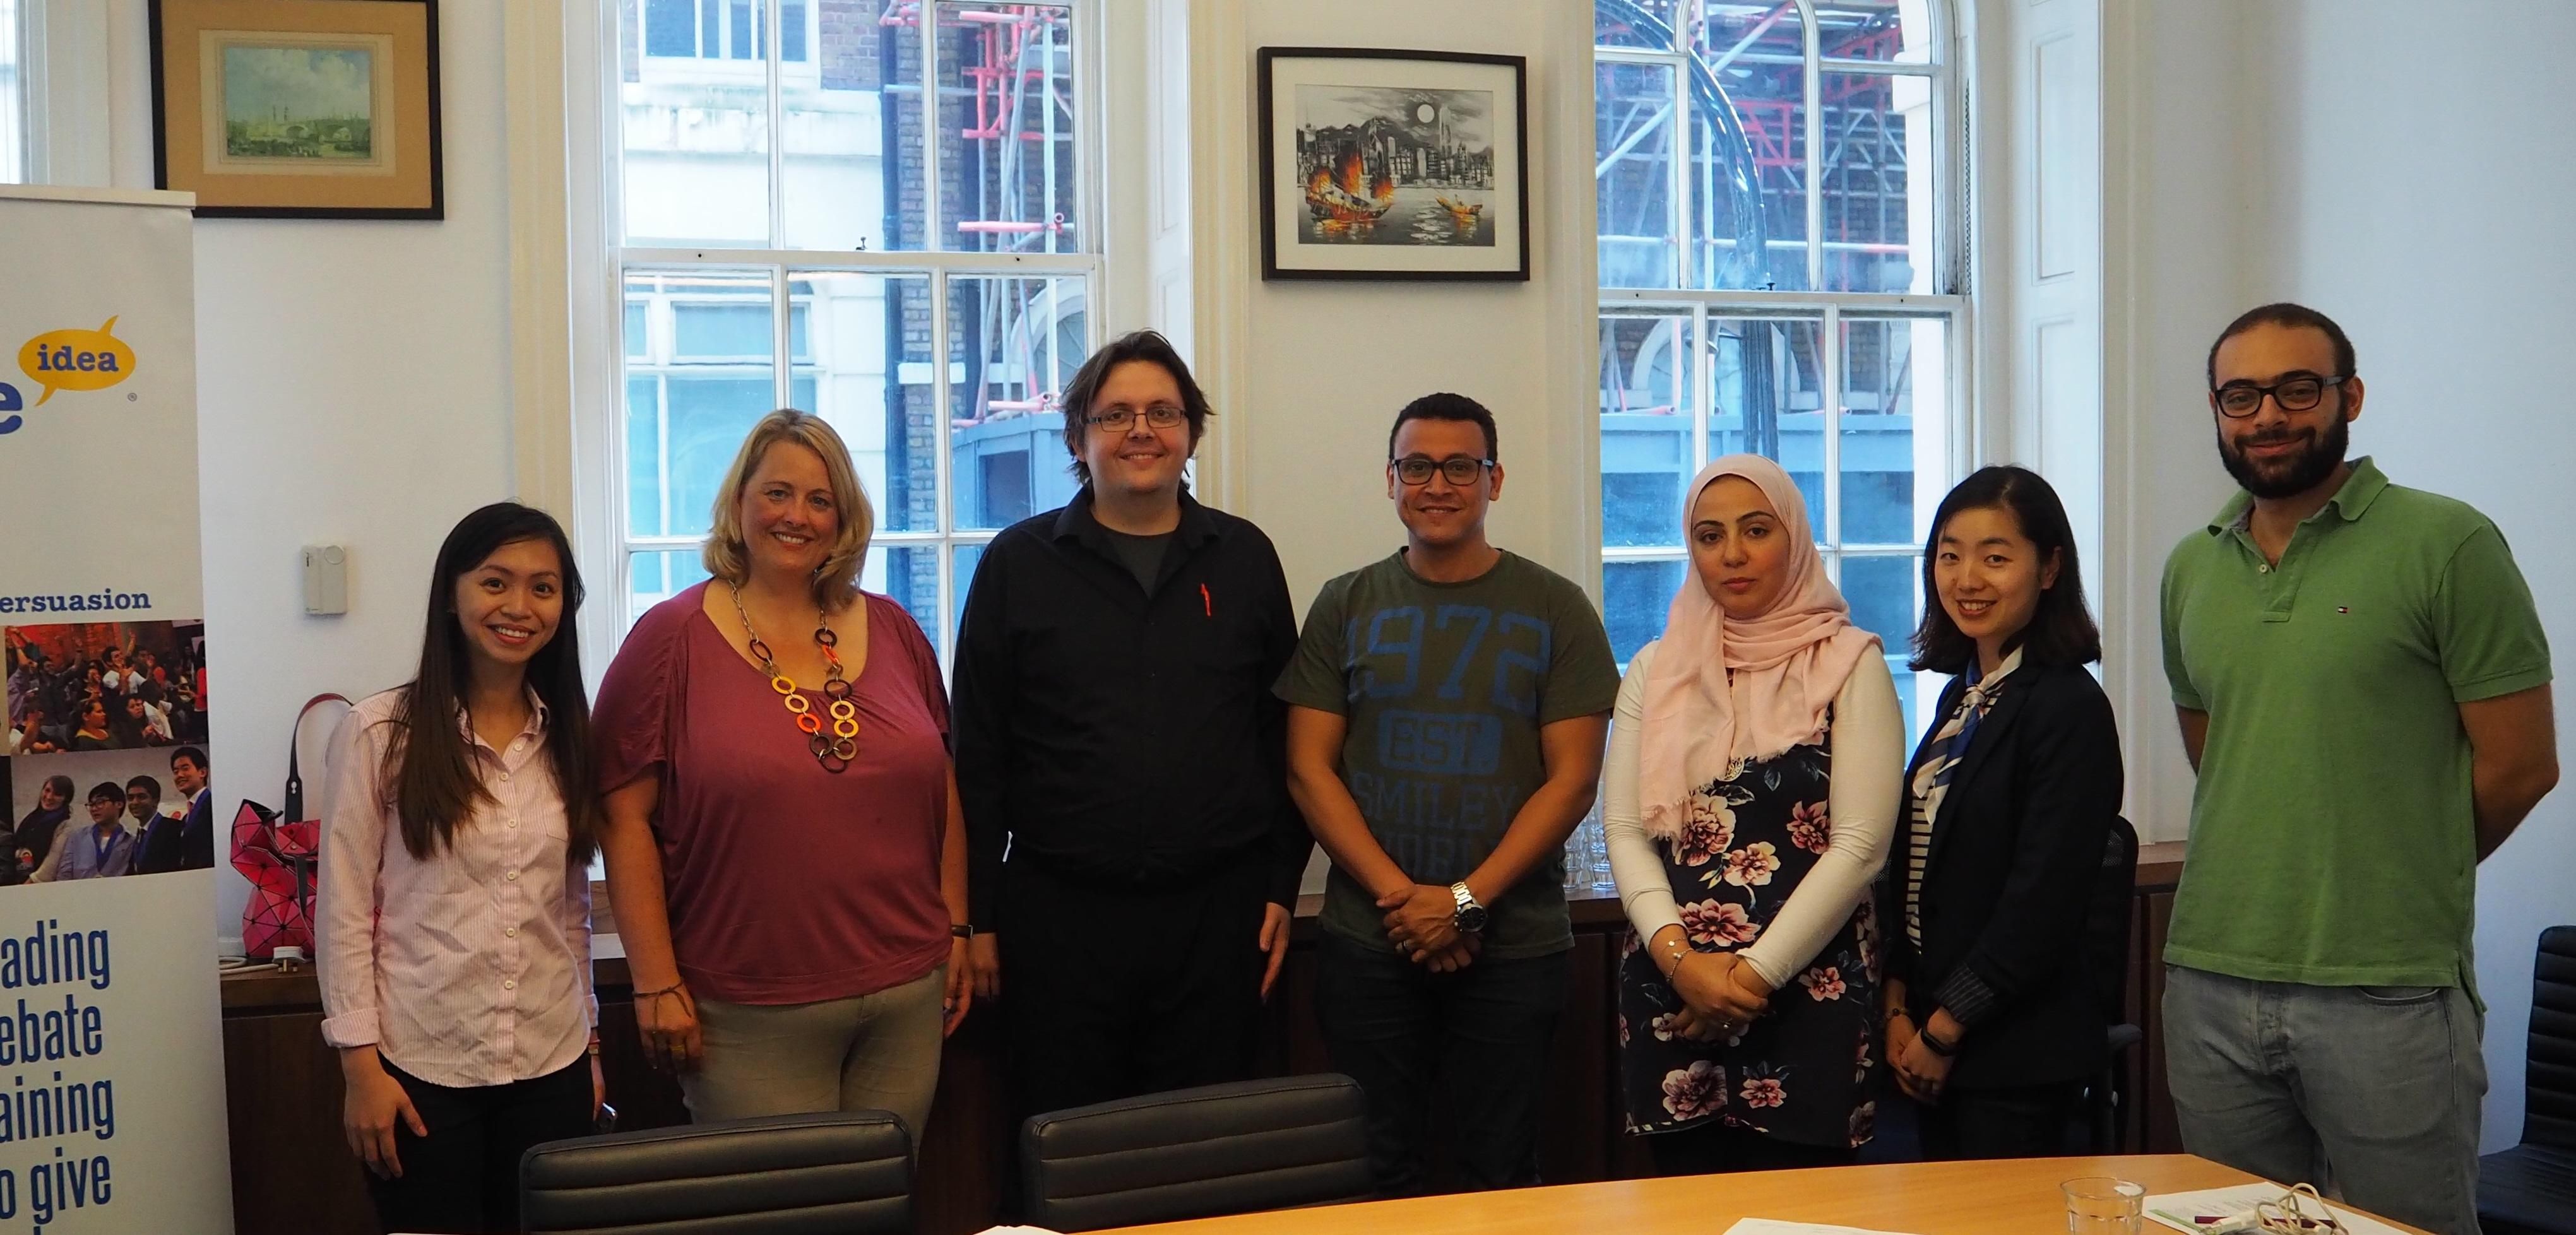 International Debate Education Association Internship in London 2017